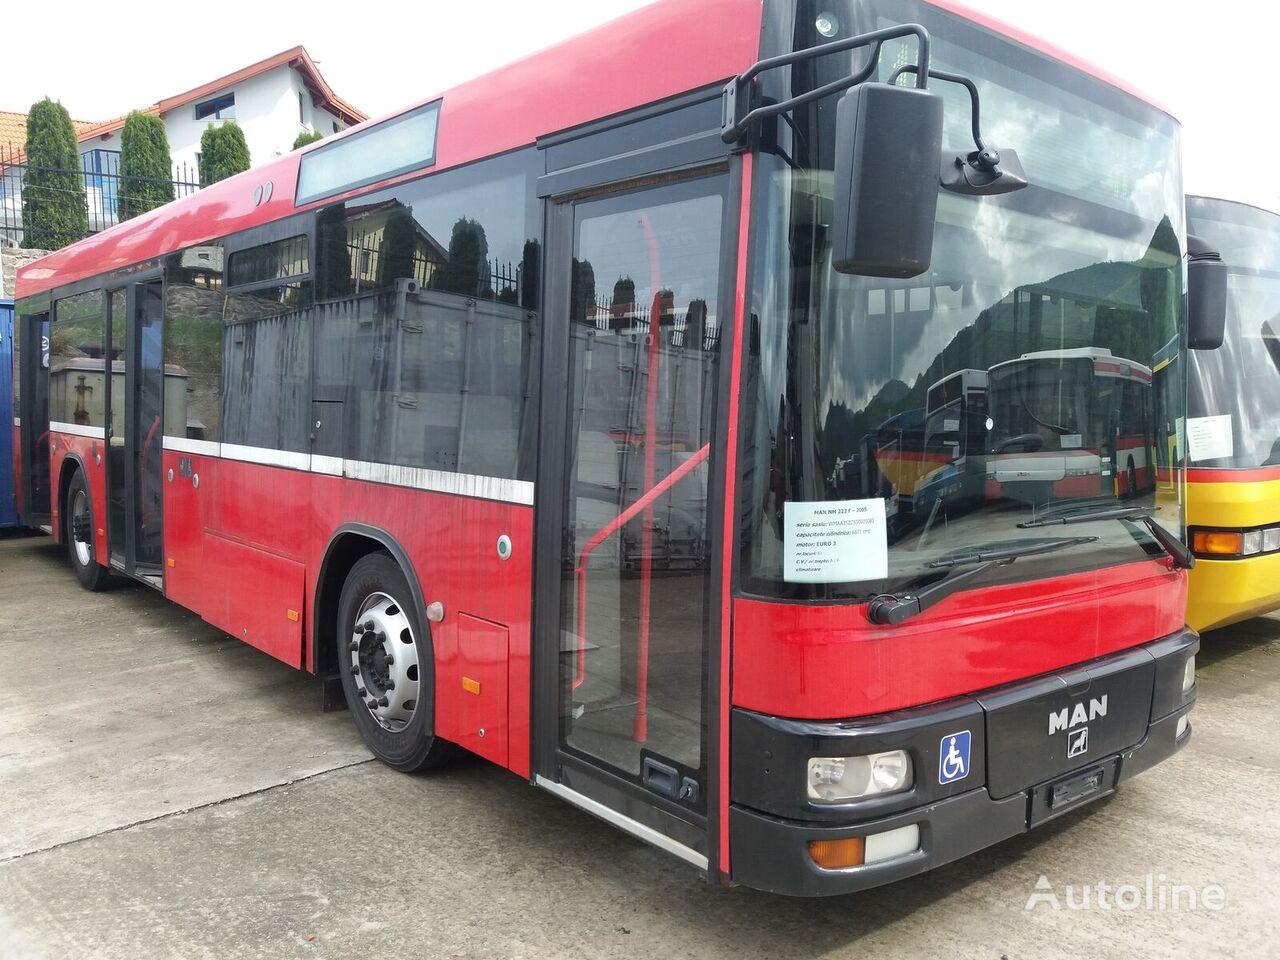 MAN NM 223 F stadsbus